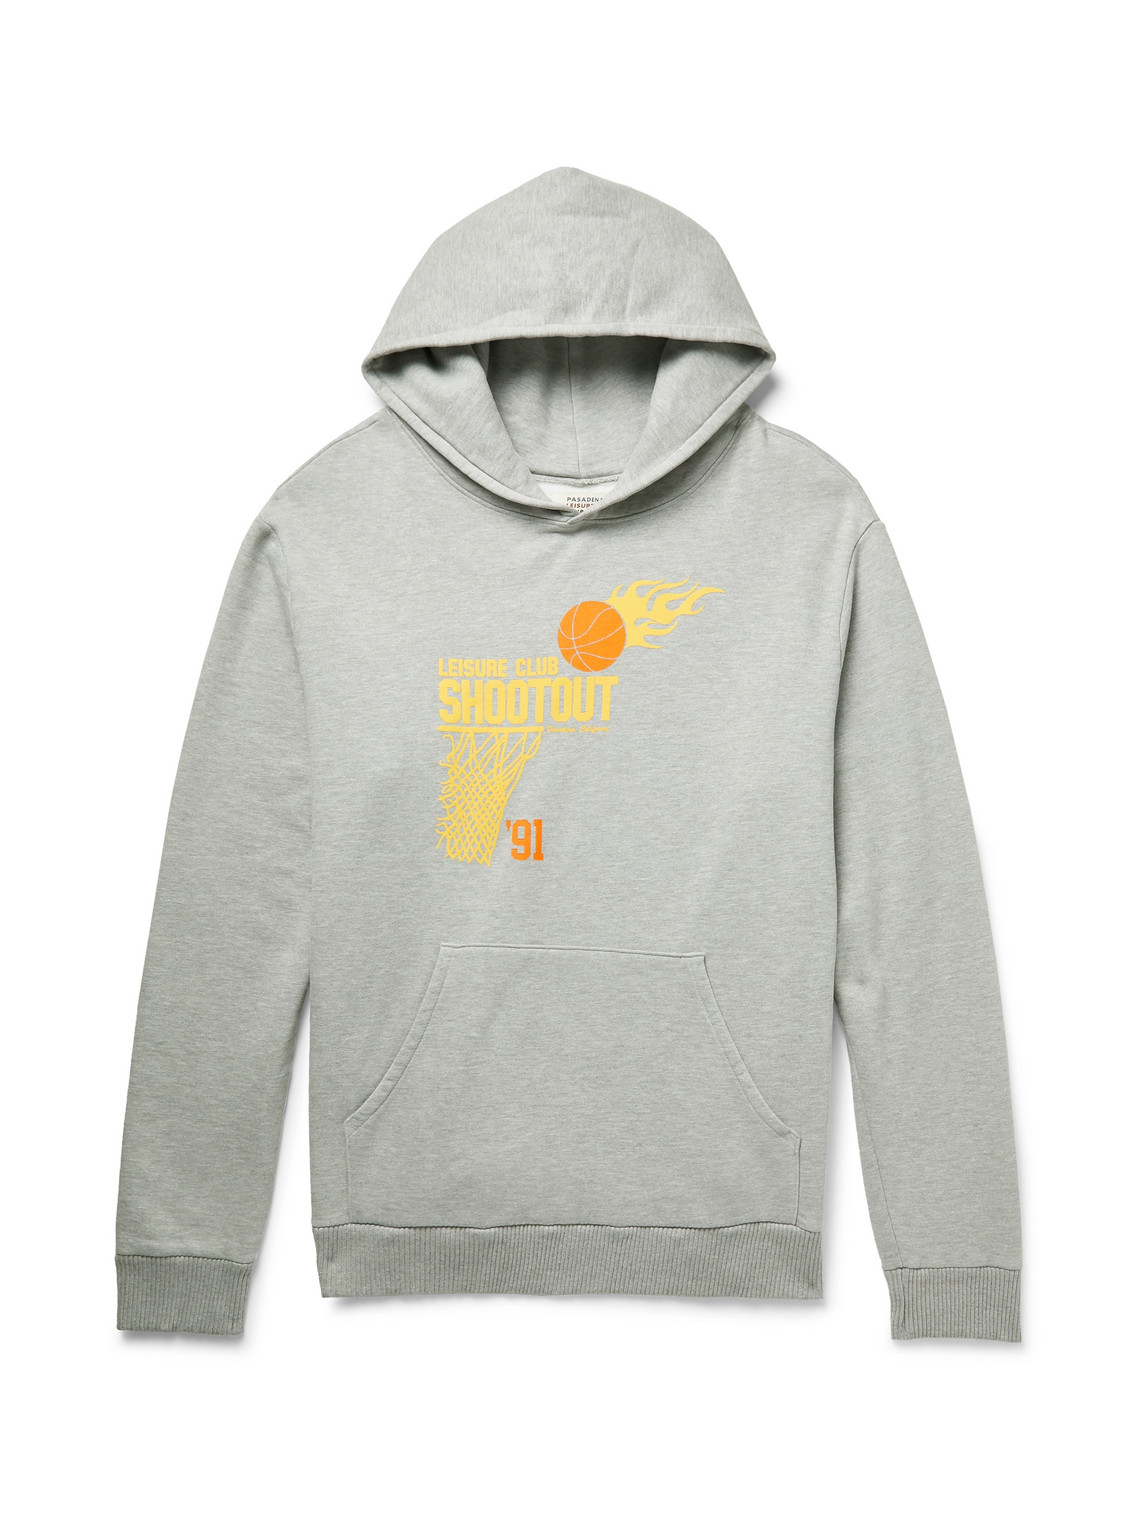 pasadena leisure club - shootout printed mélange fleece-back cotton-jersey hoodie - men - gray - xs